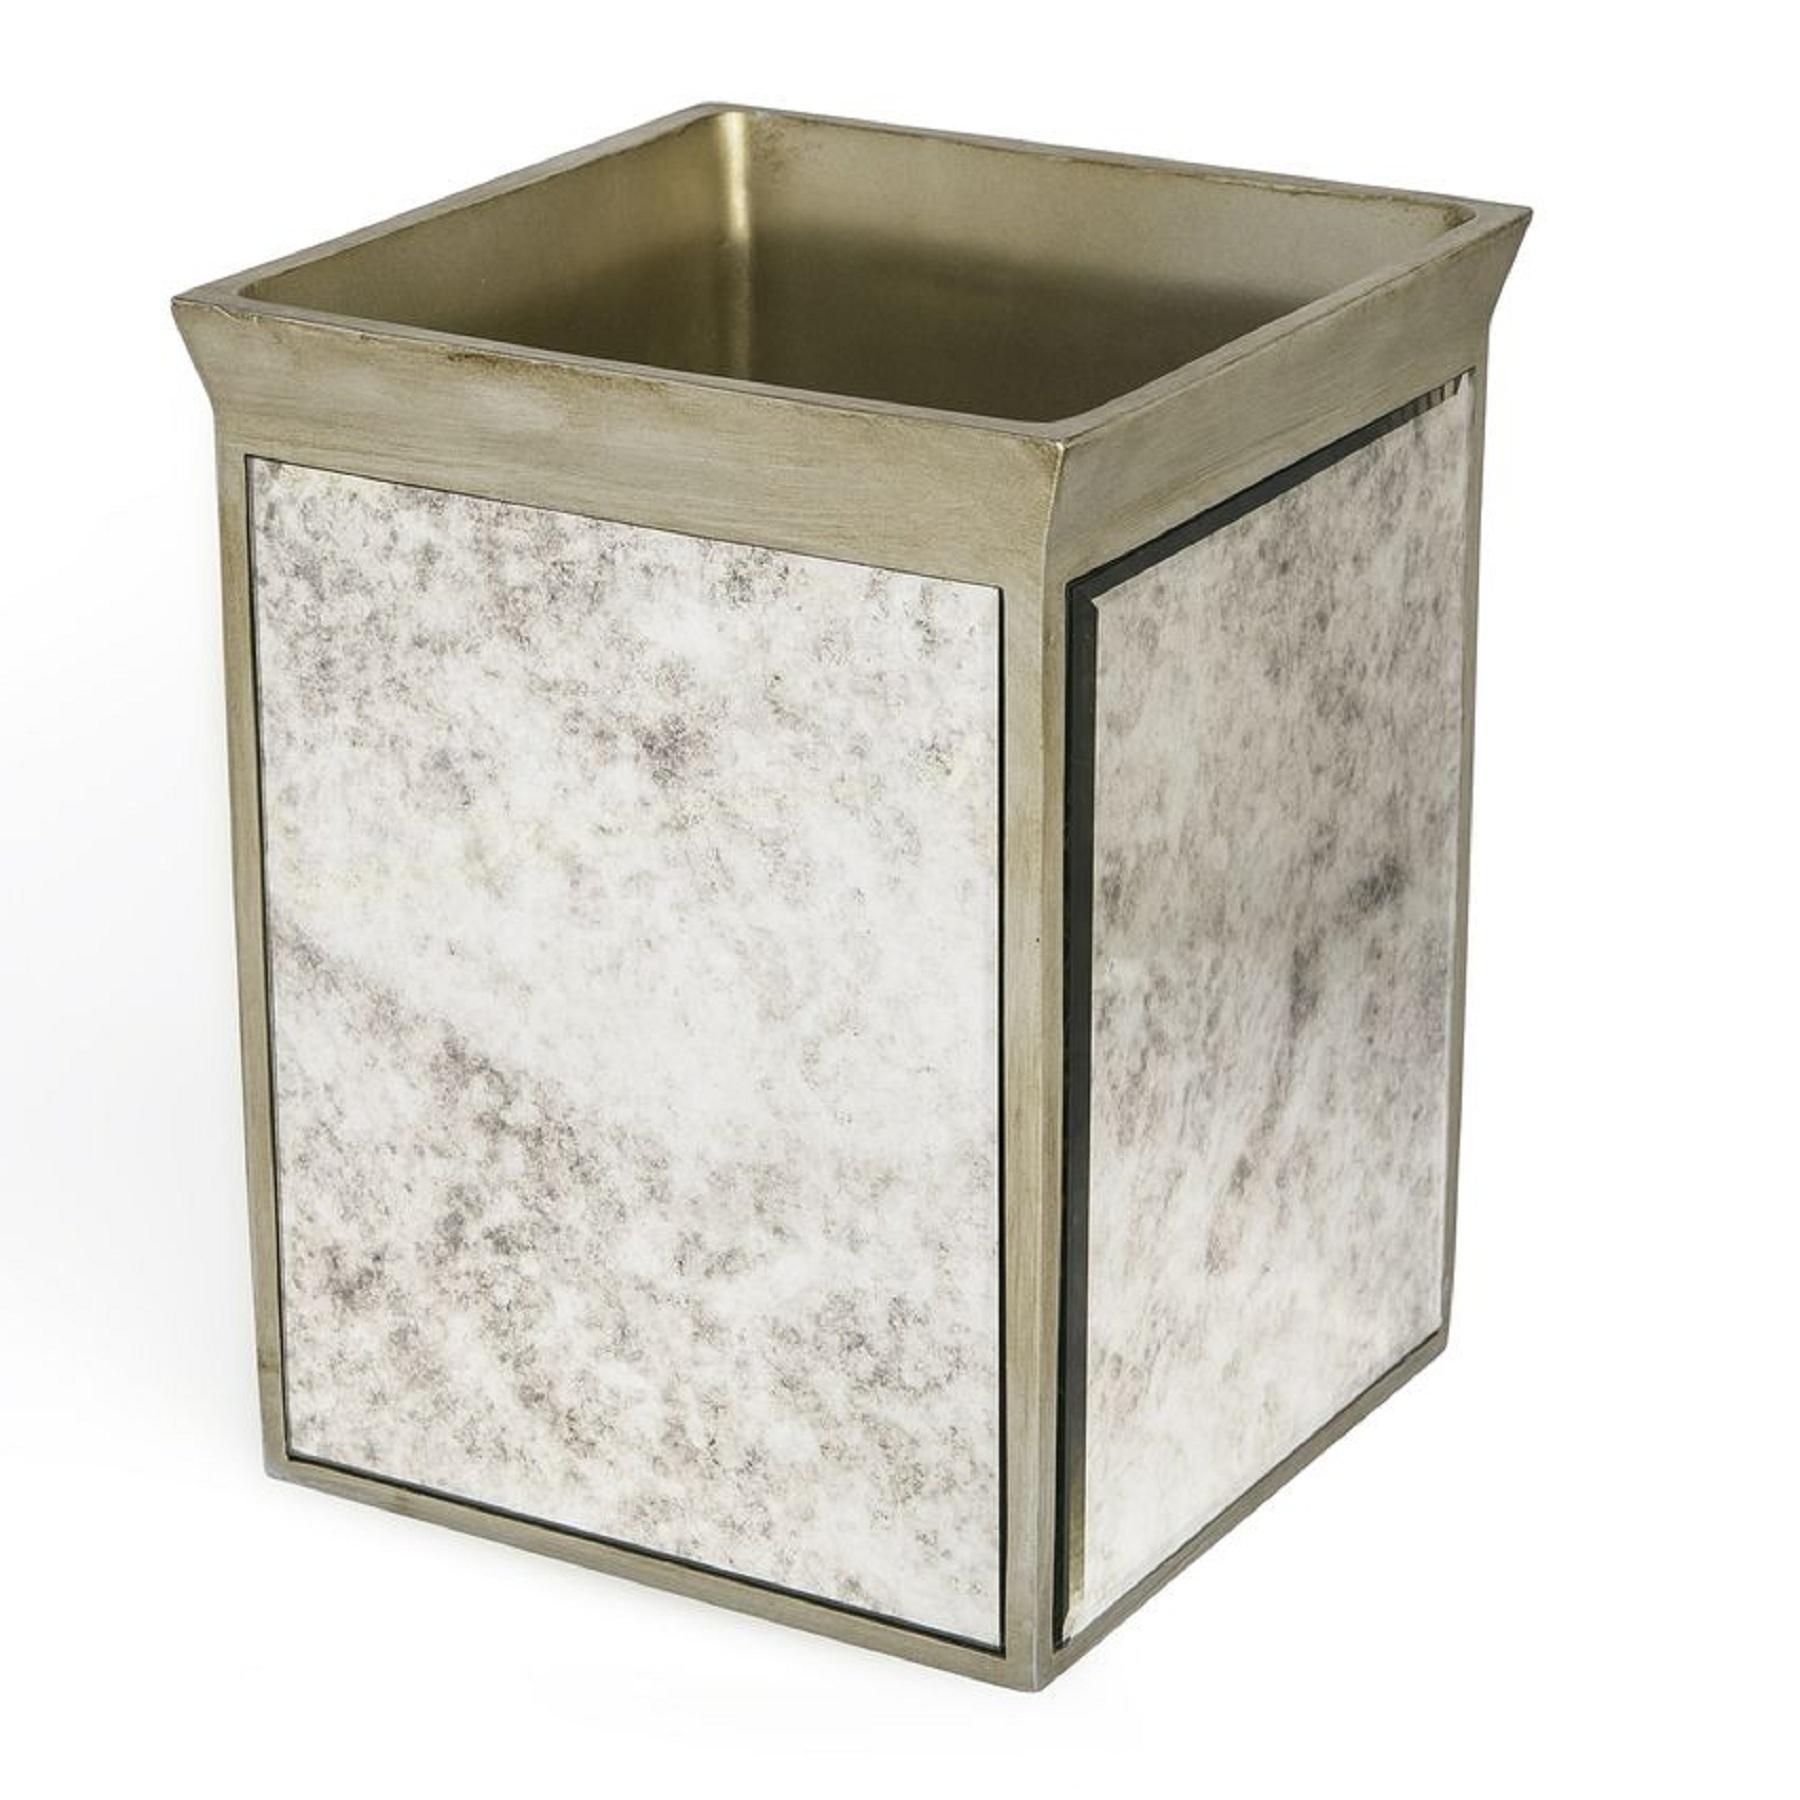 Ведра для мусора Ведро для мусора Palazzo Vintage Mirror от Kassatex vedro-dlya-musora-palazzo-vintage-mirror-ot-kassatex-ssha-kitay.jpeg